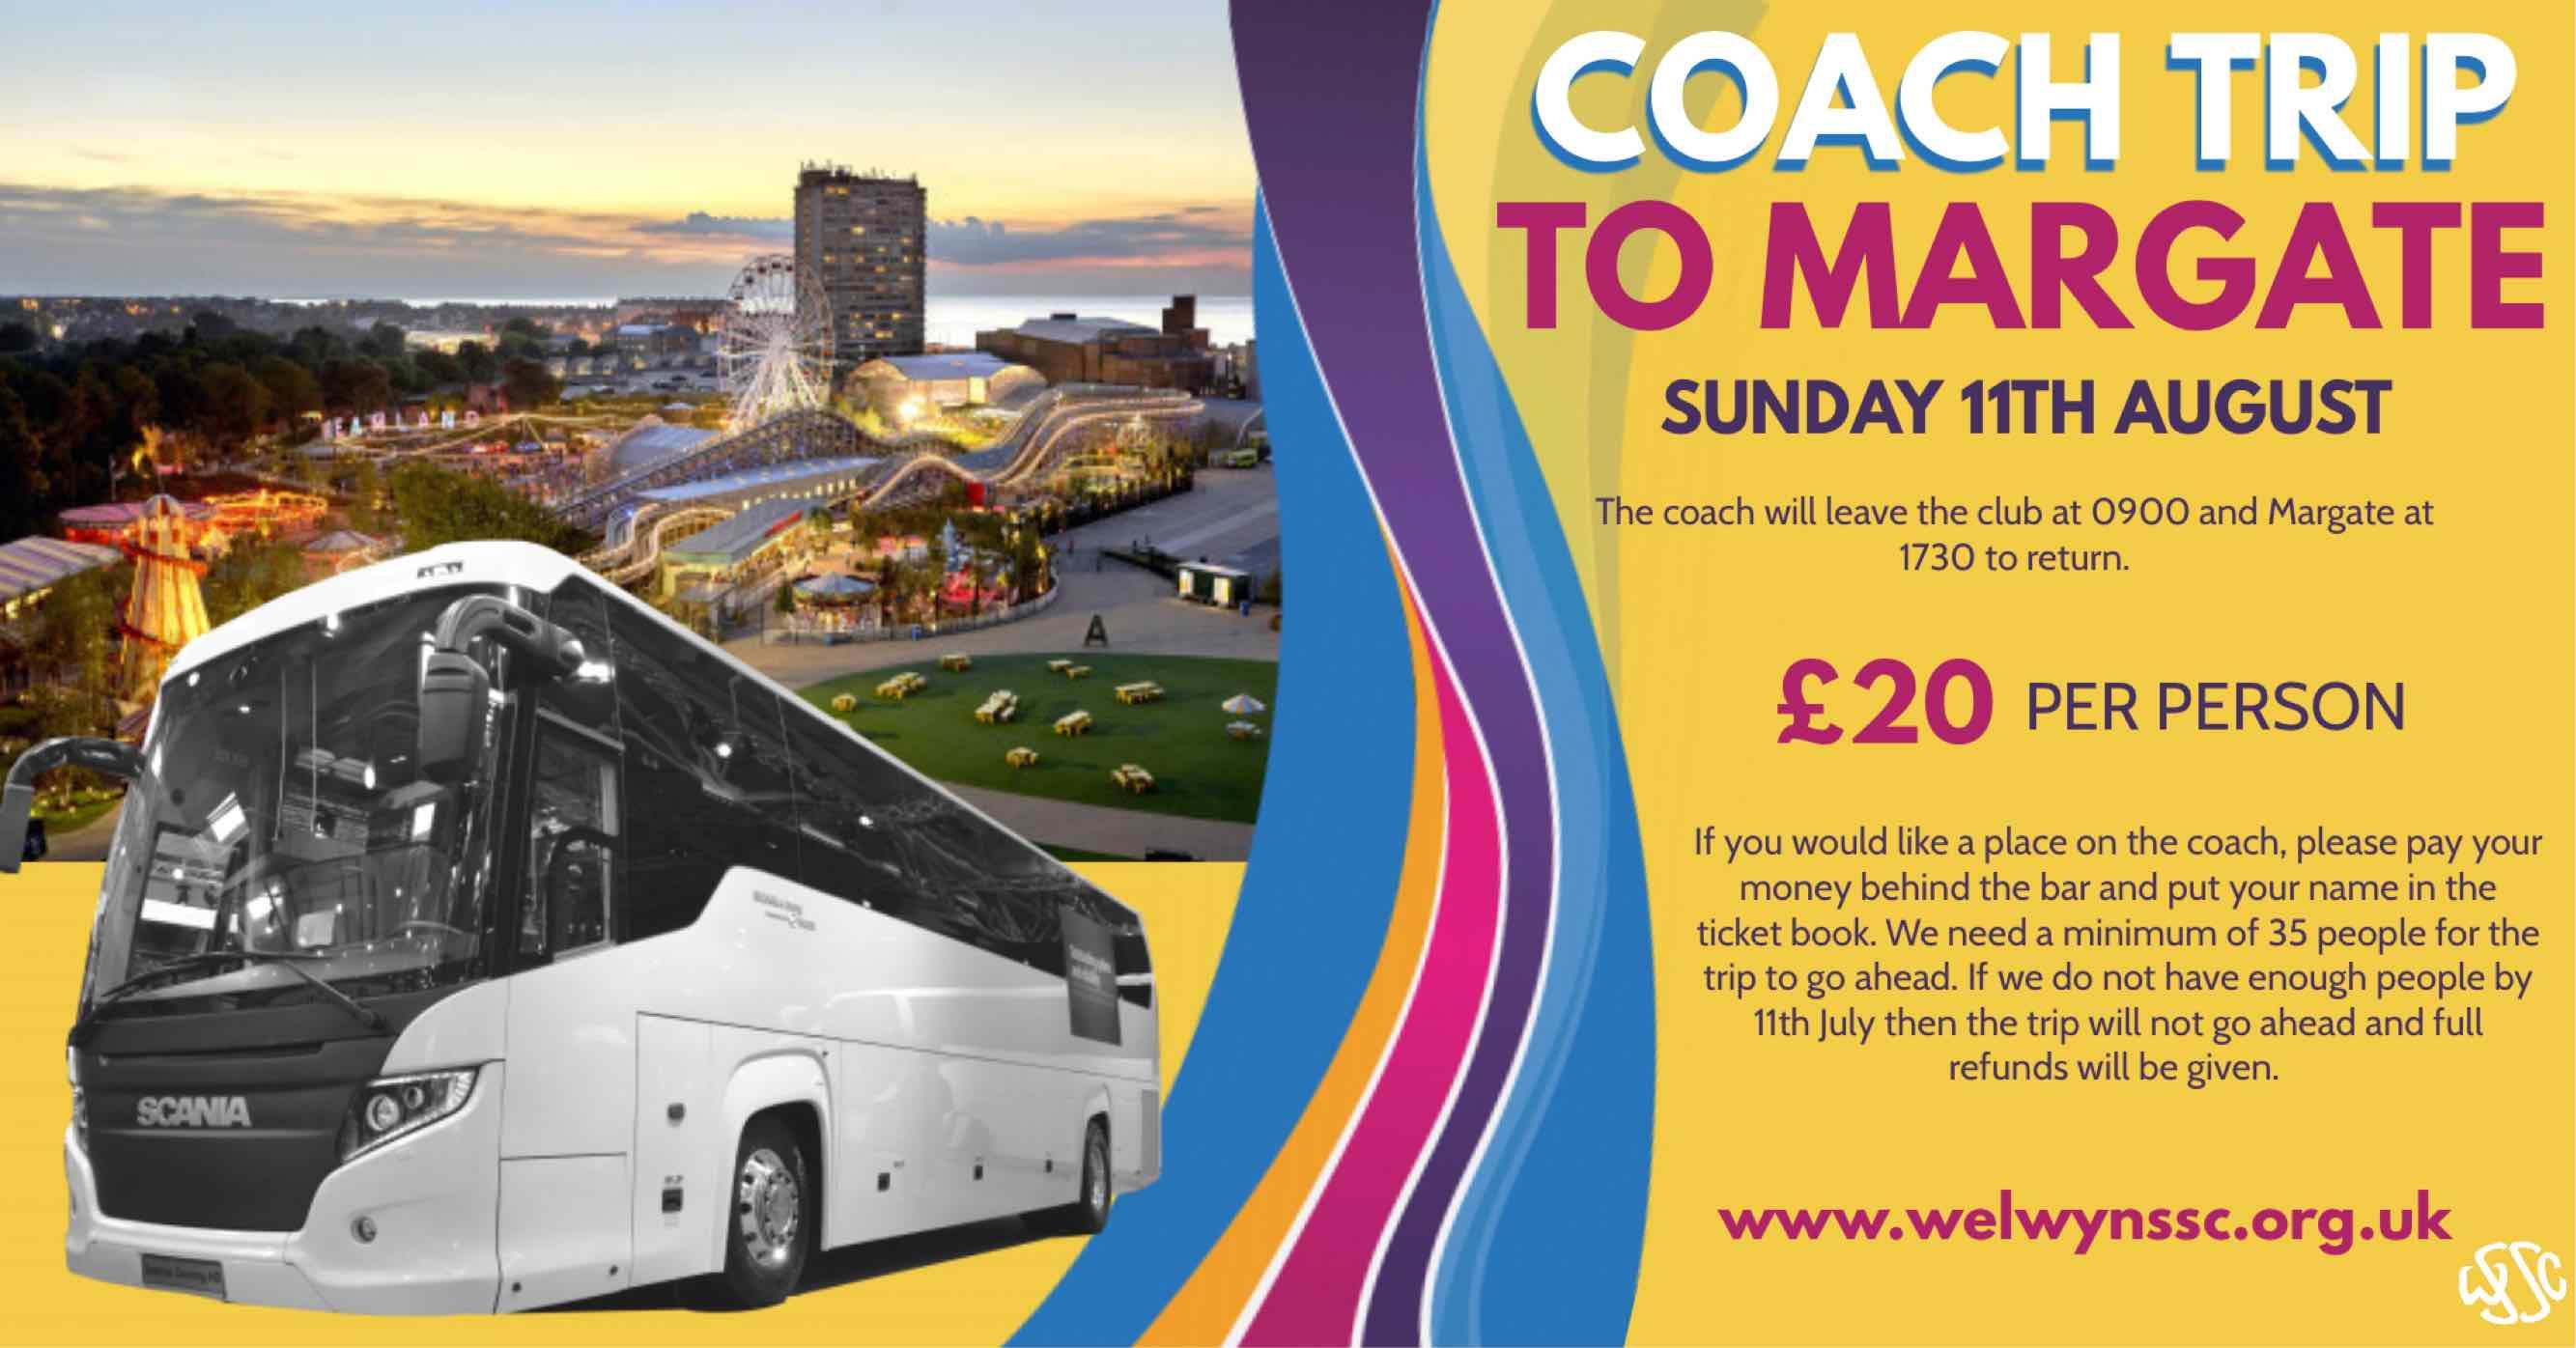 Coach Trip - Margate banner image